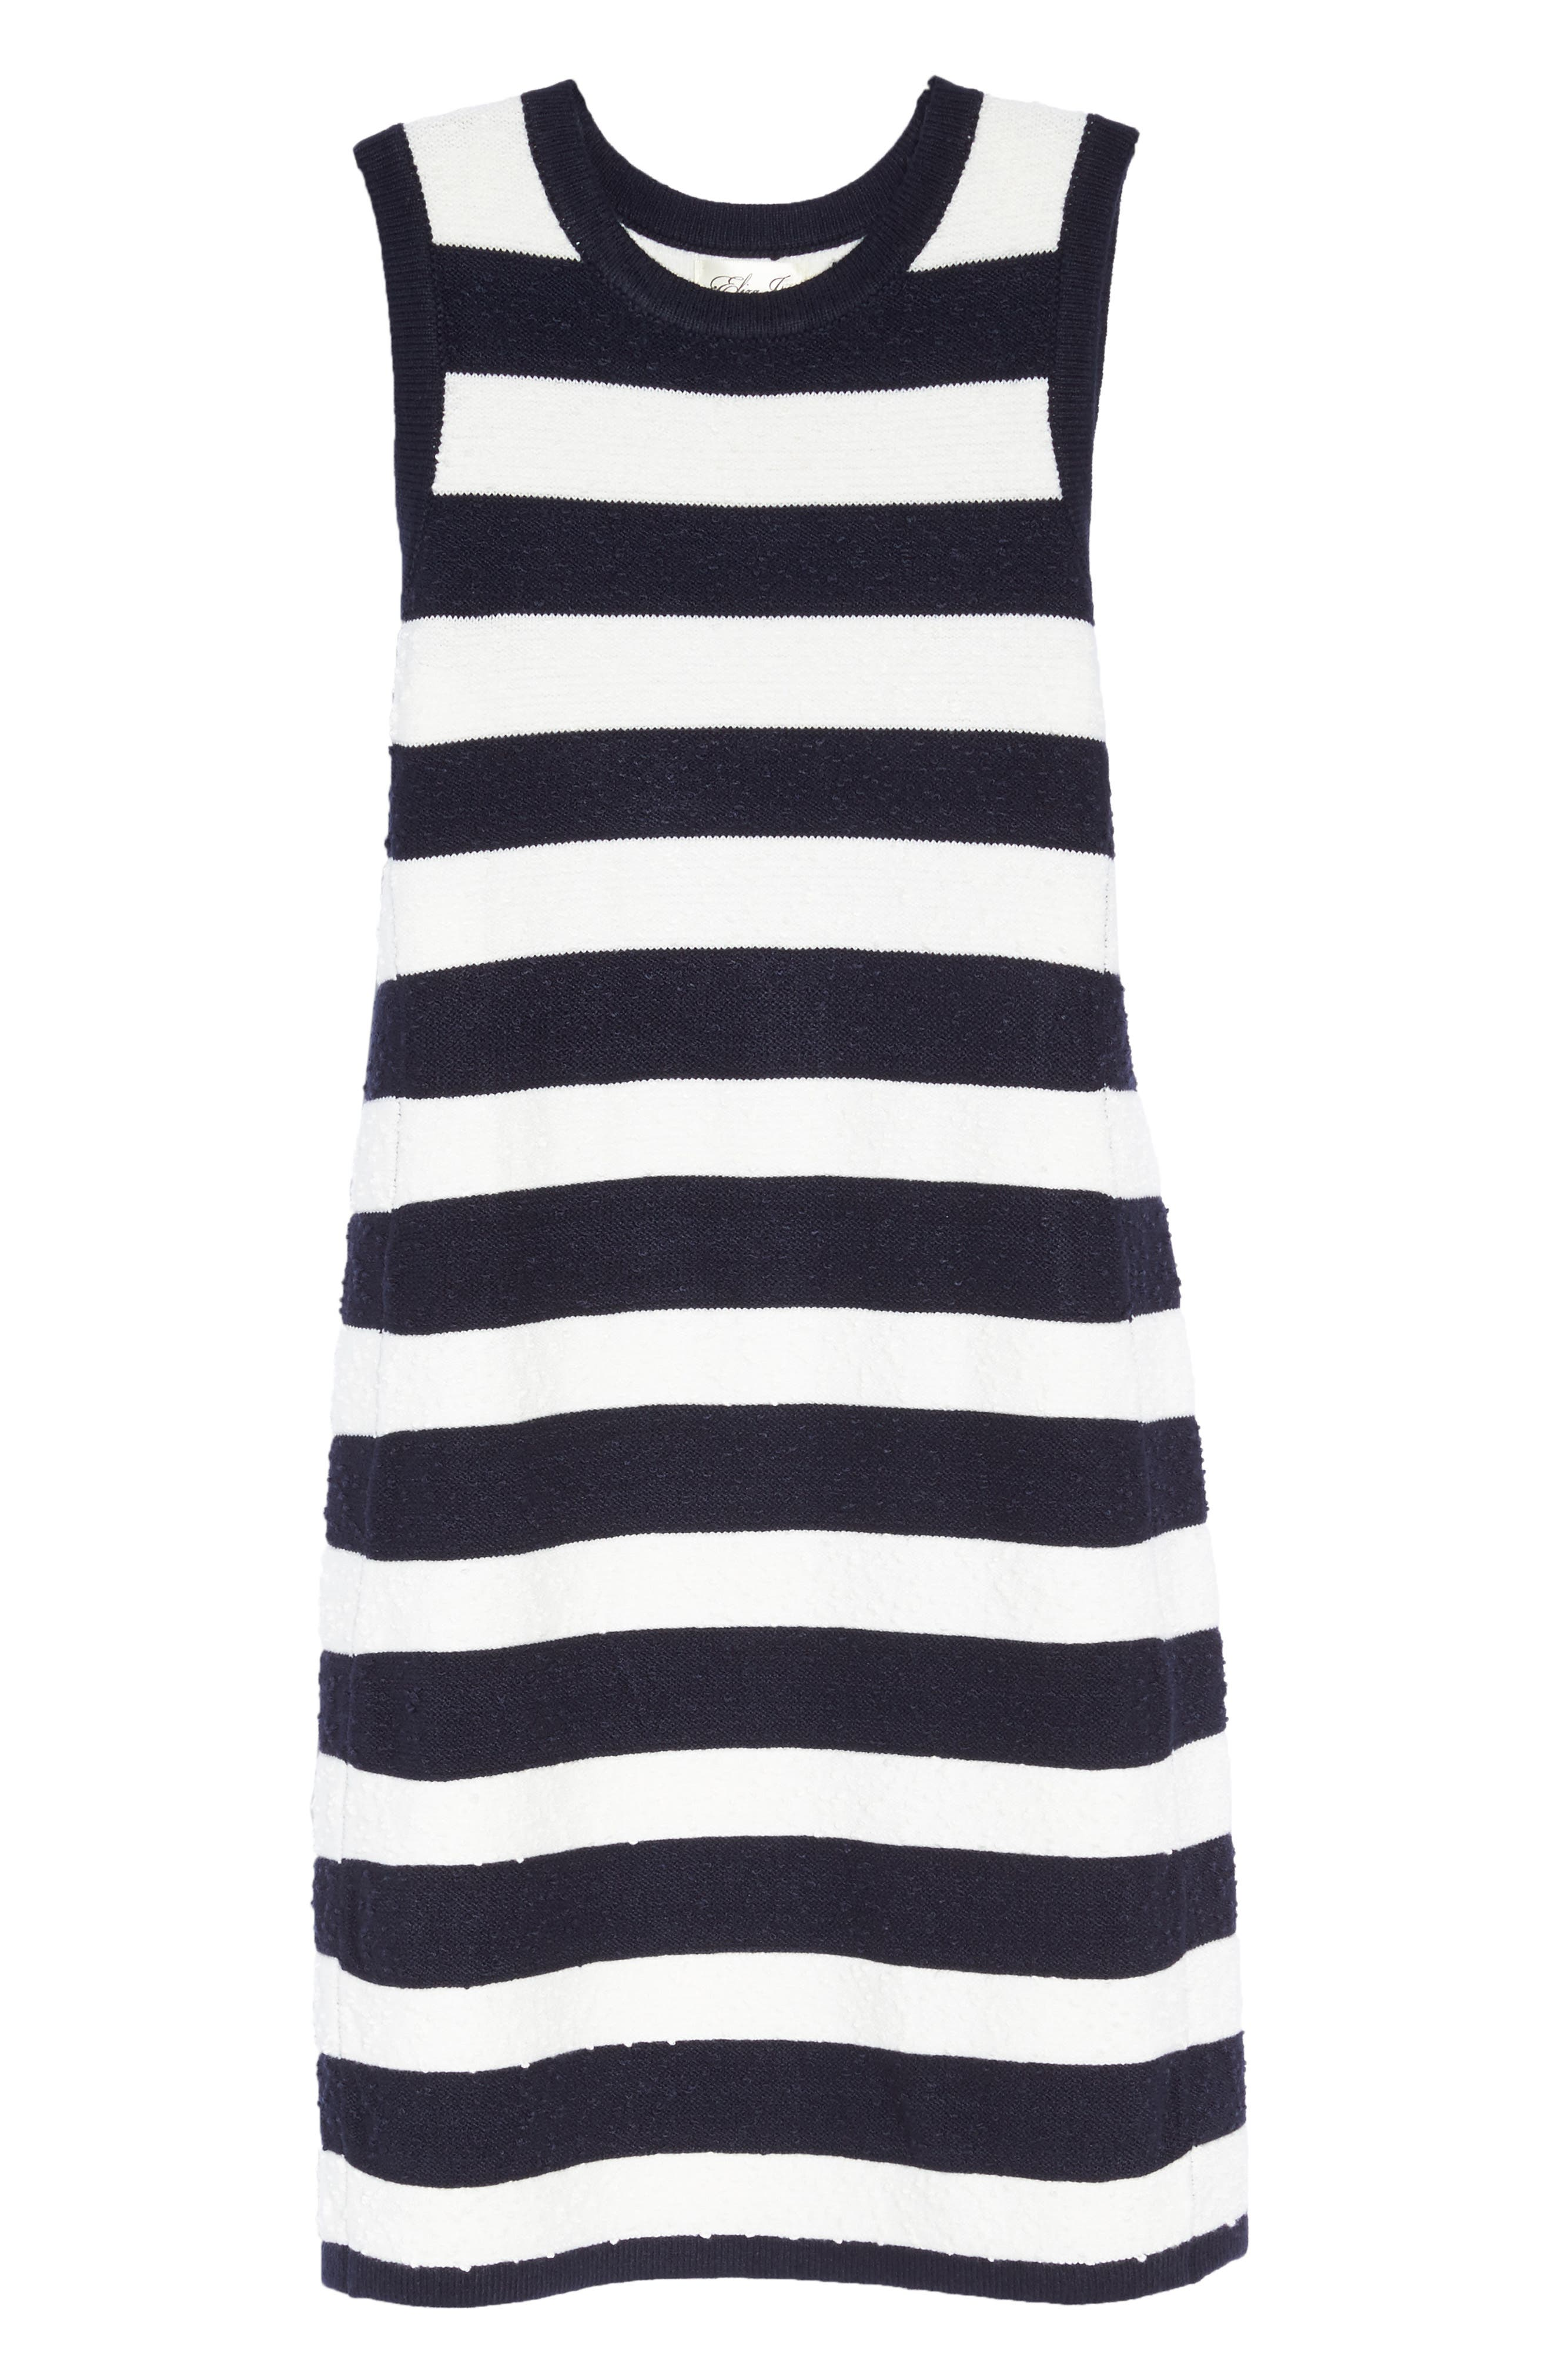 Stripe Sweater Dress,                             Alternate thumbnail 6, color,                             Navy/ Ivory